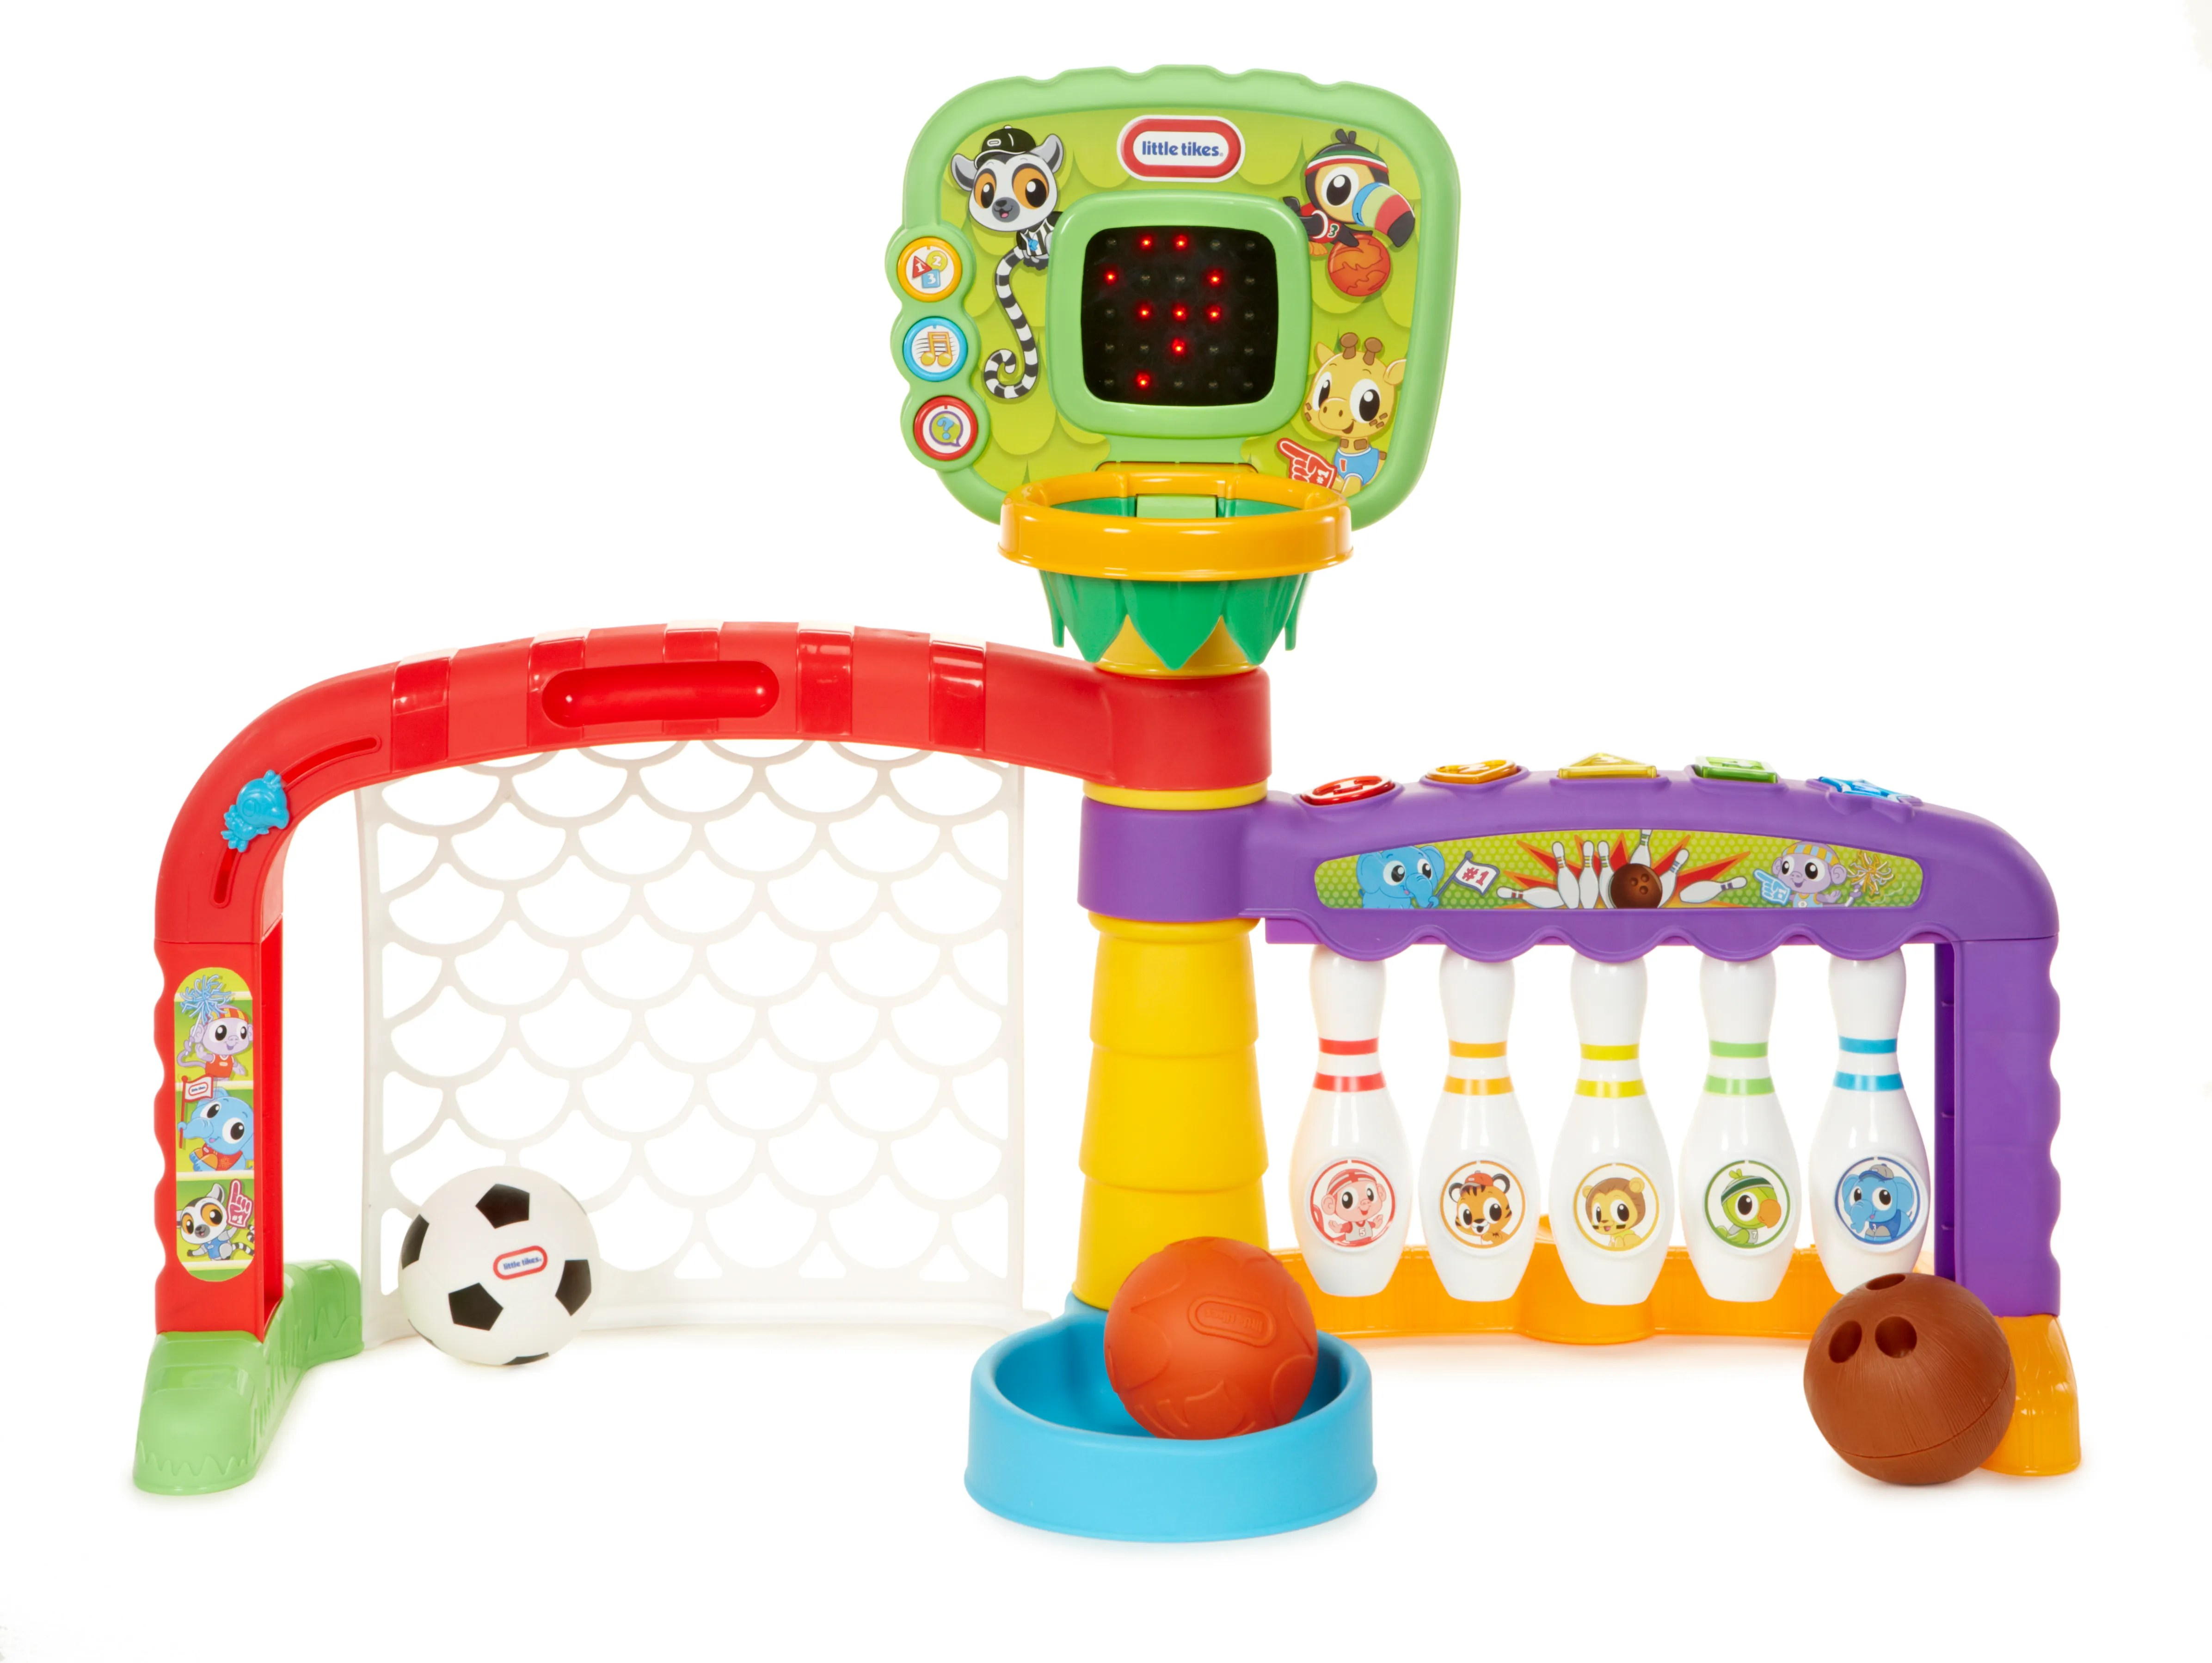 Bankruptcy Judge Approves 14m Toys R Us Executive Bonus